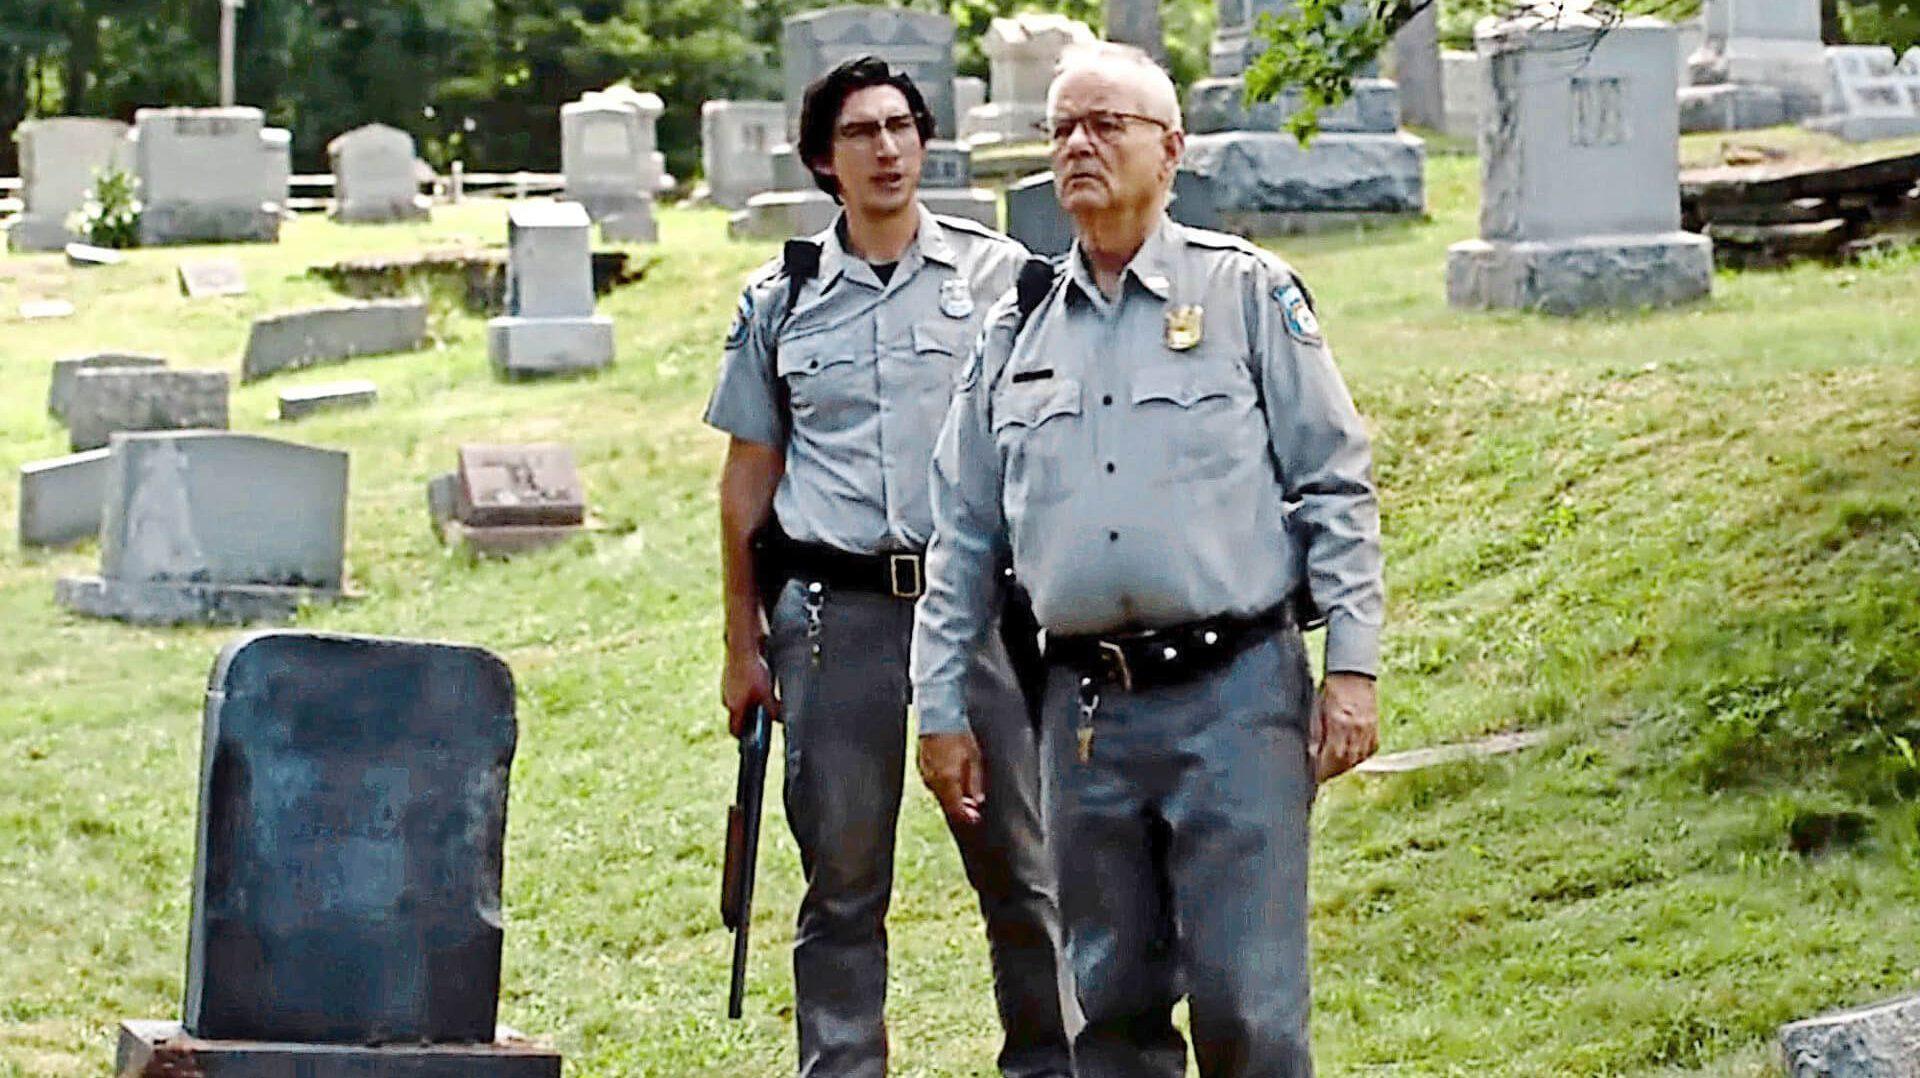 مردگان نمی میرند The Dead Don't Die  –  واکنش سینماگران روشنفکر به دوران پسا ترامپ